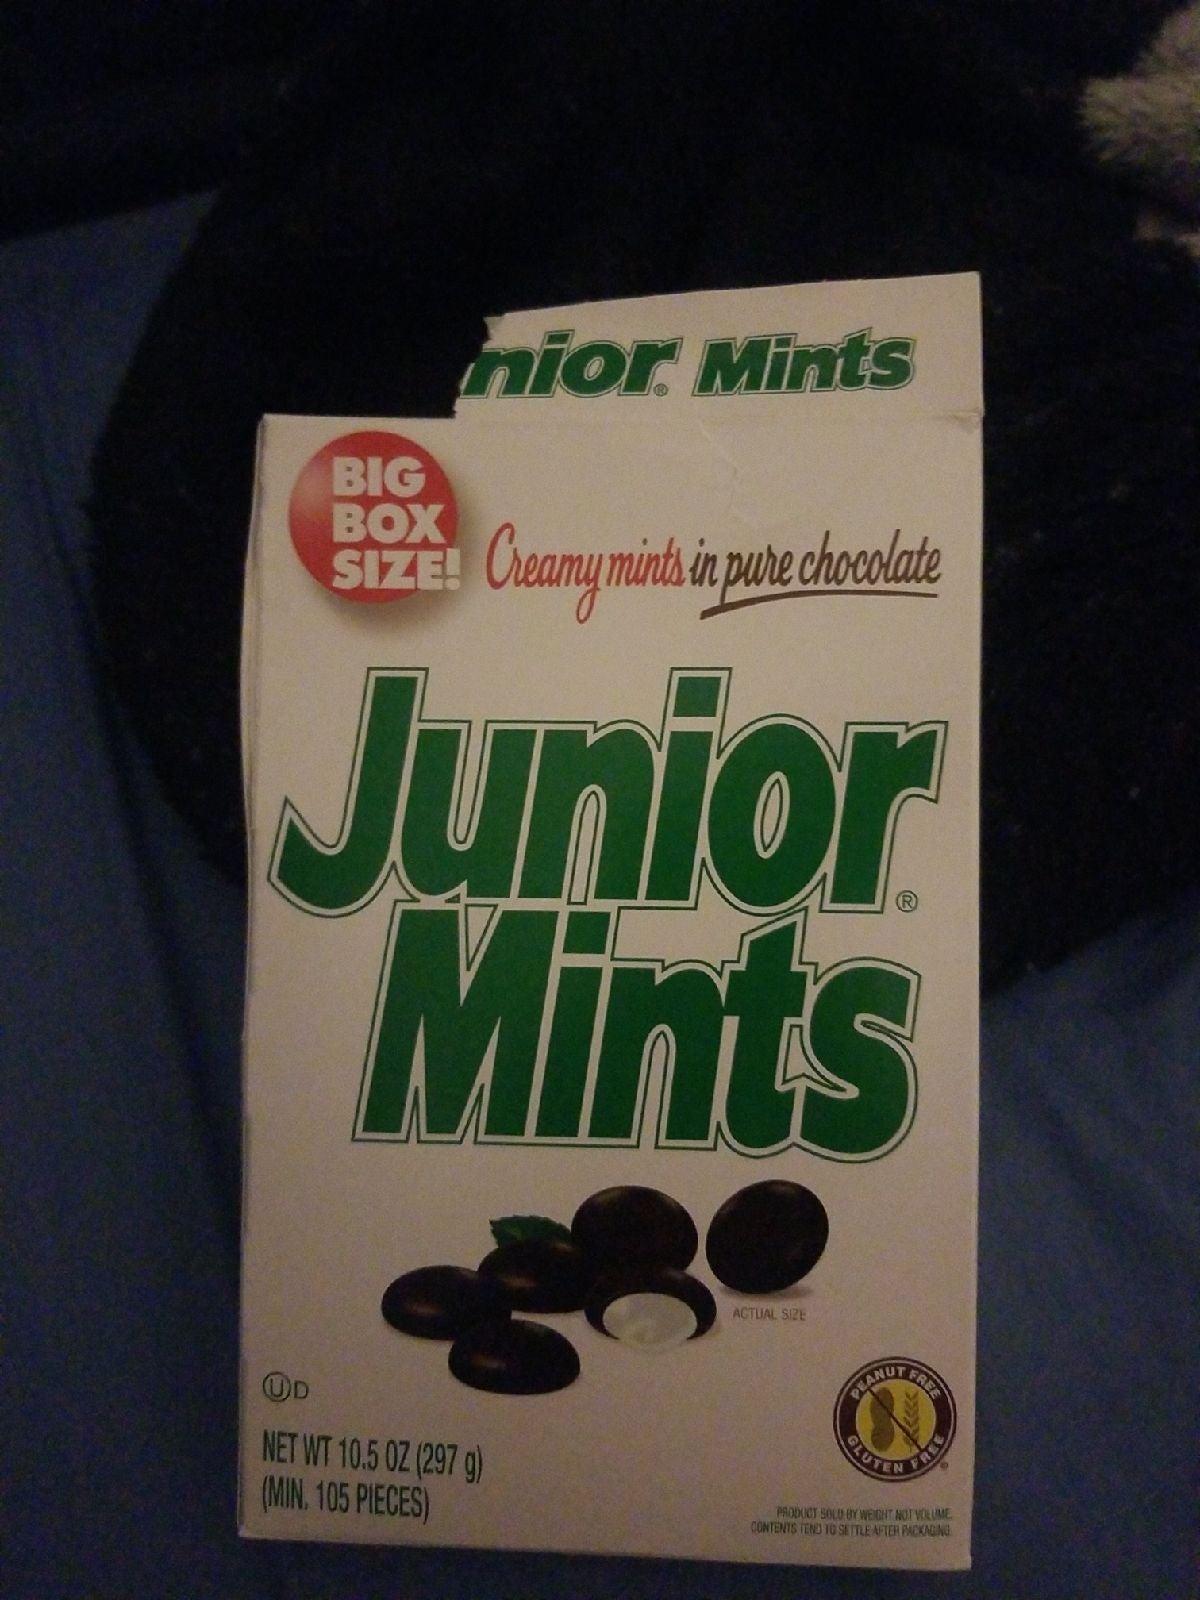 Open box of mints